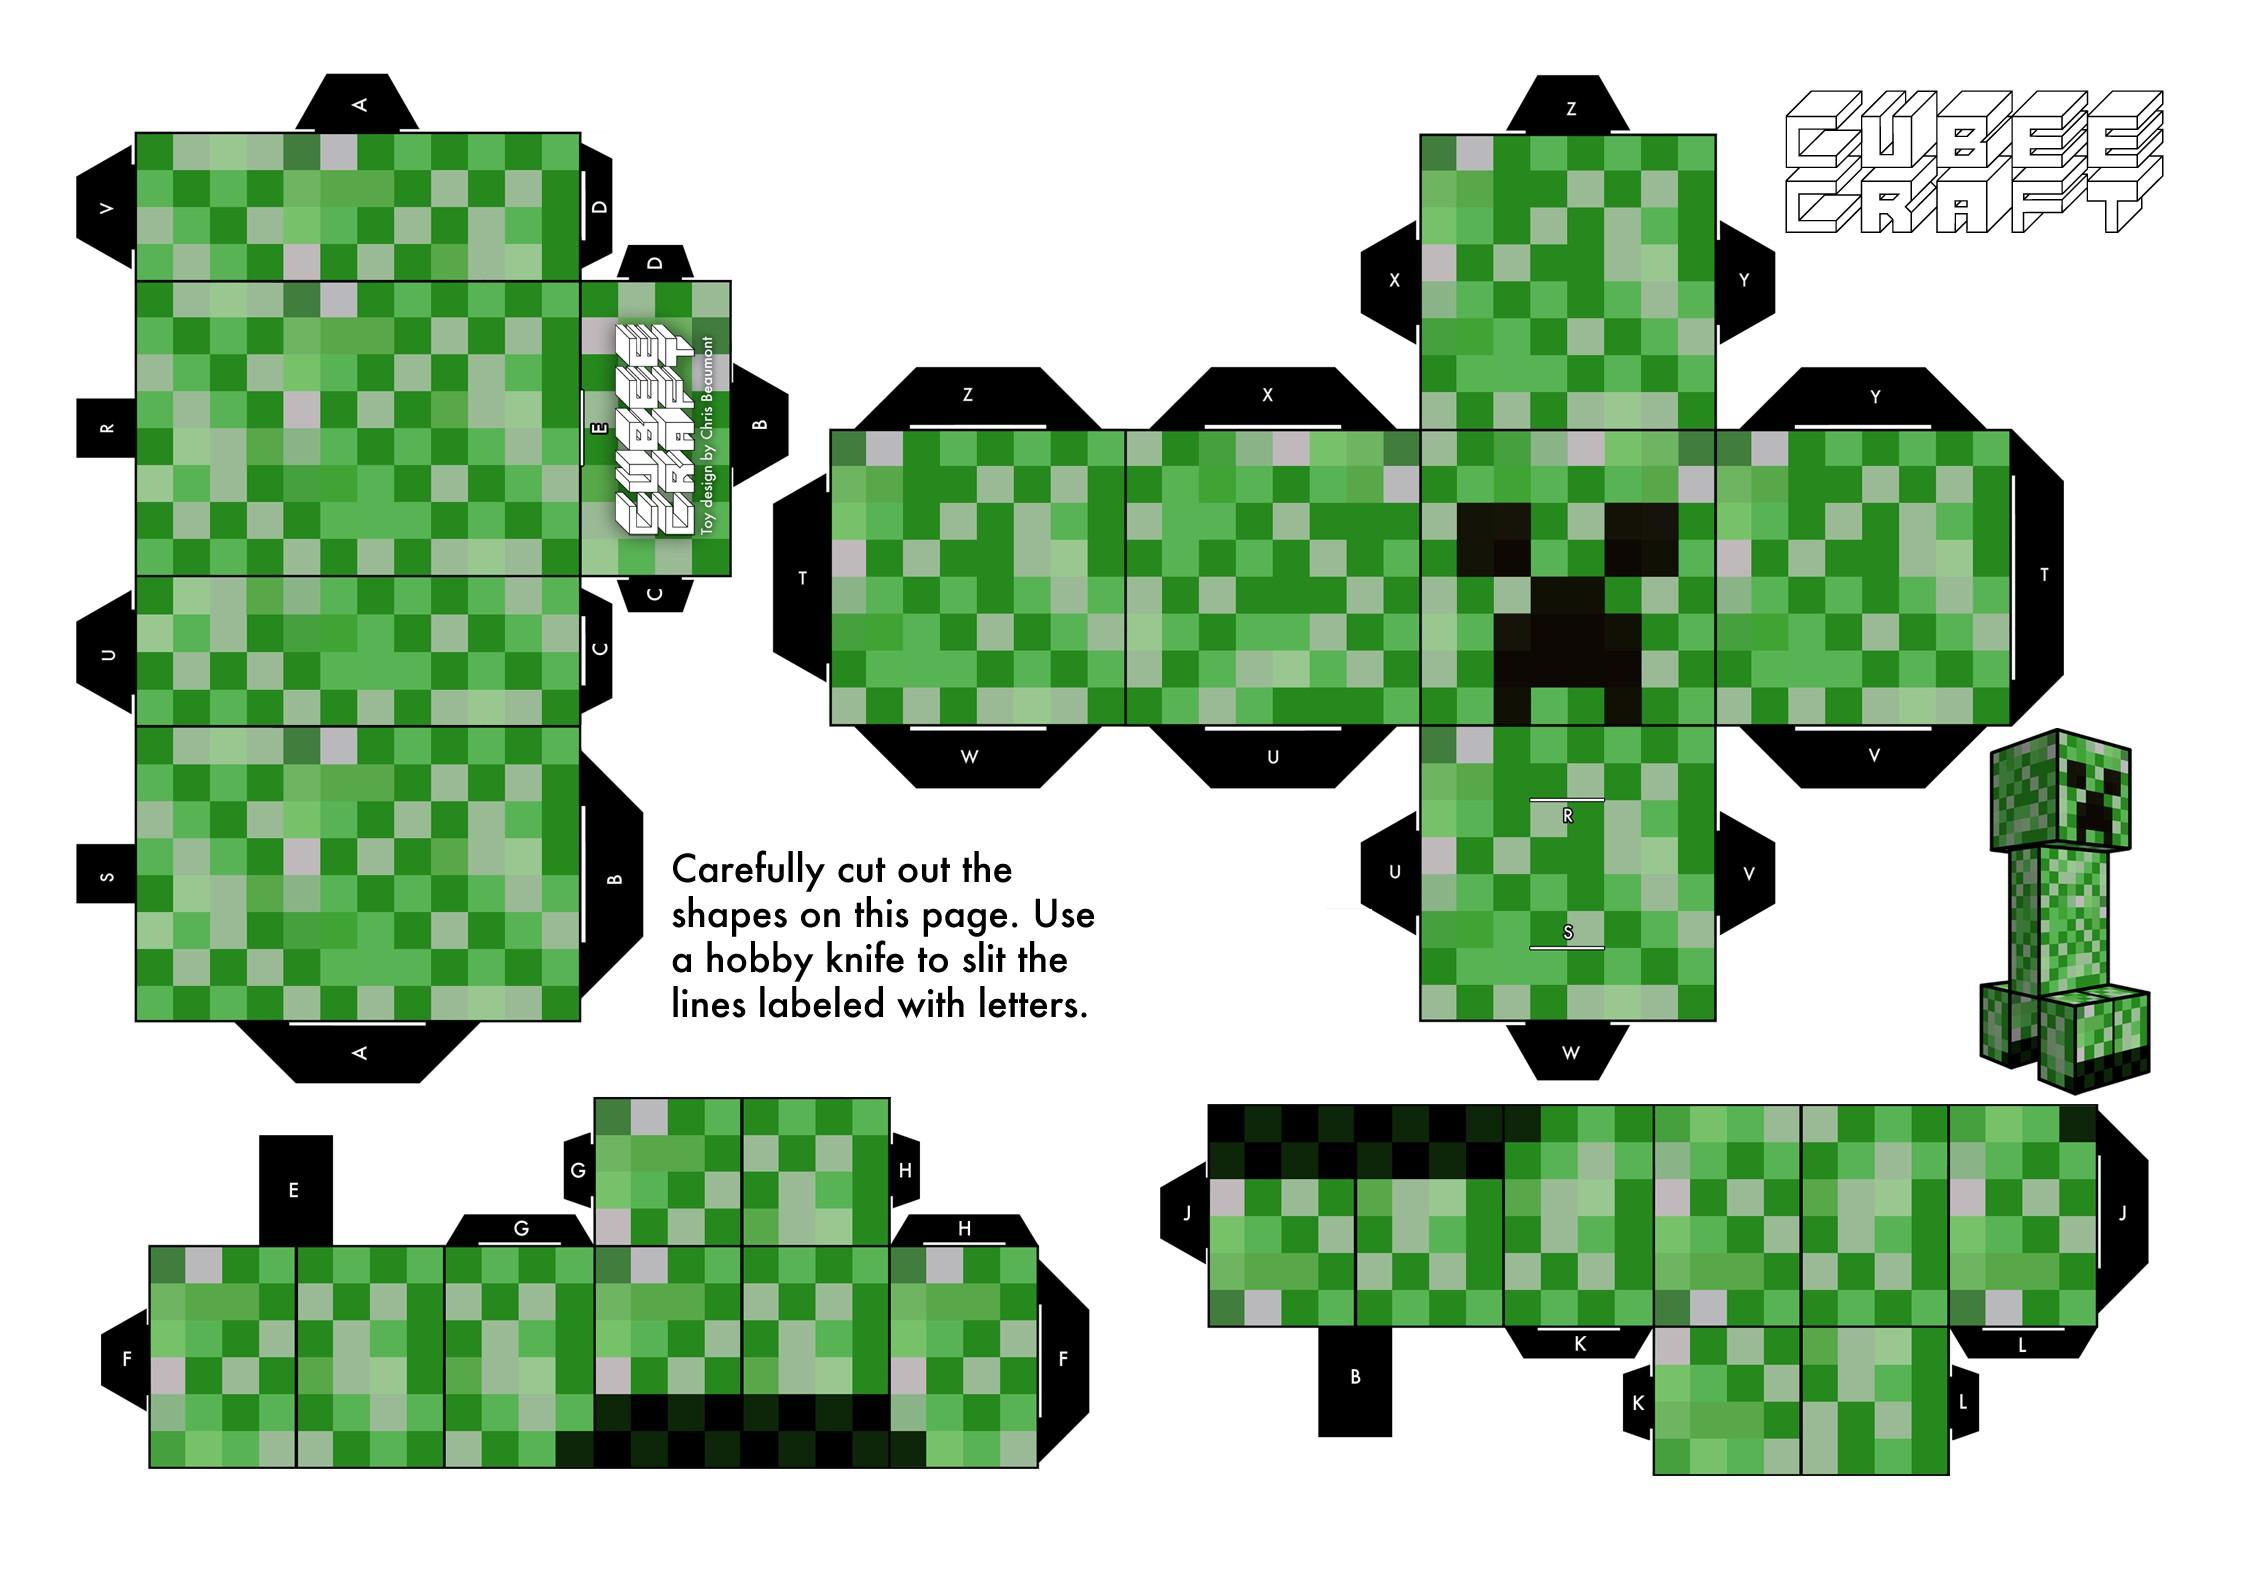 Papercraft Minecraft Creeper Creepers Papercraft Creepers Paper toys Paper toys